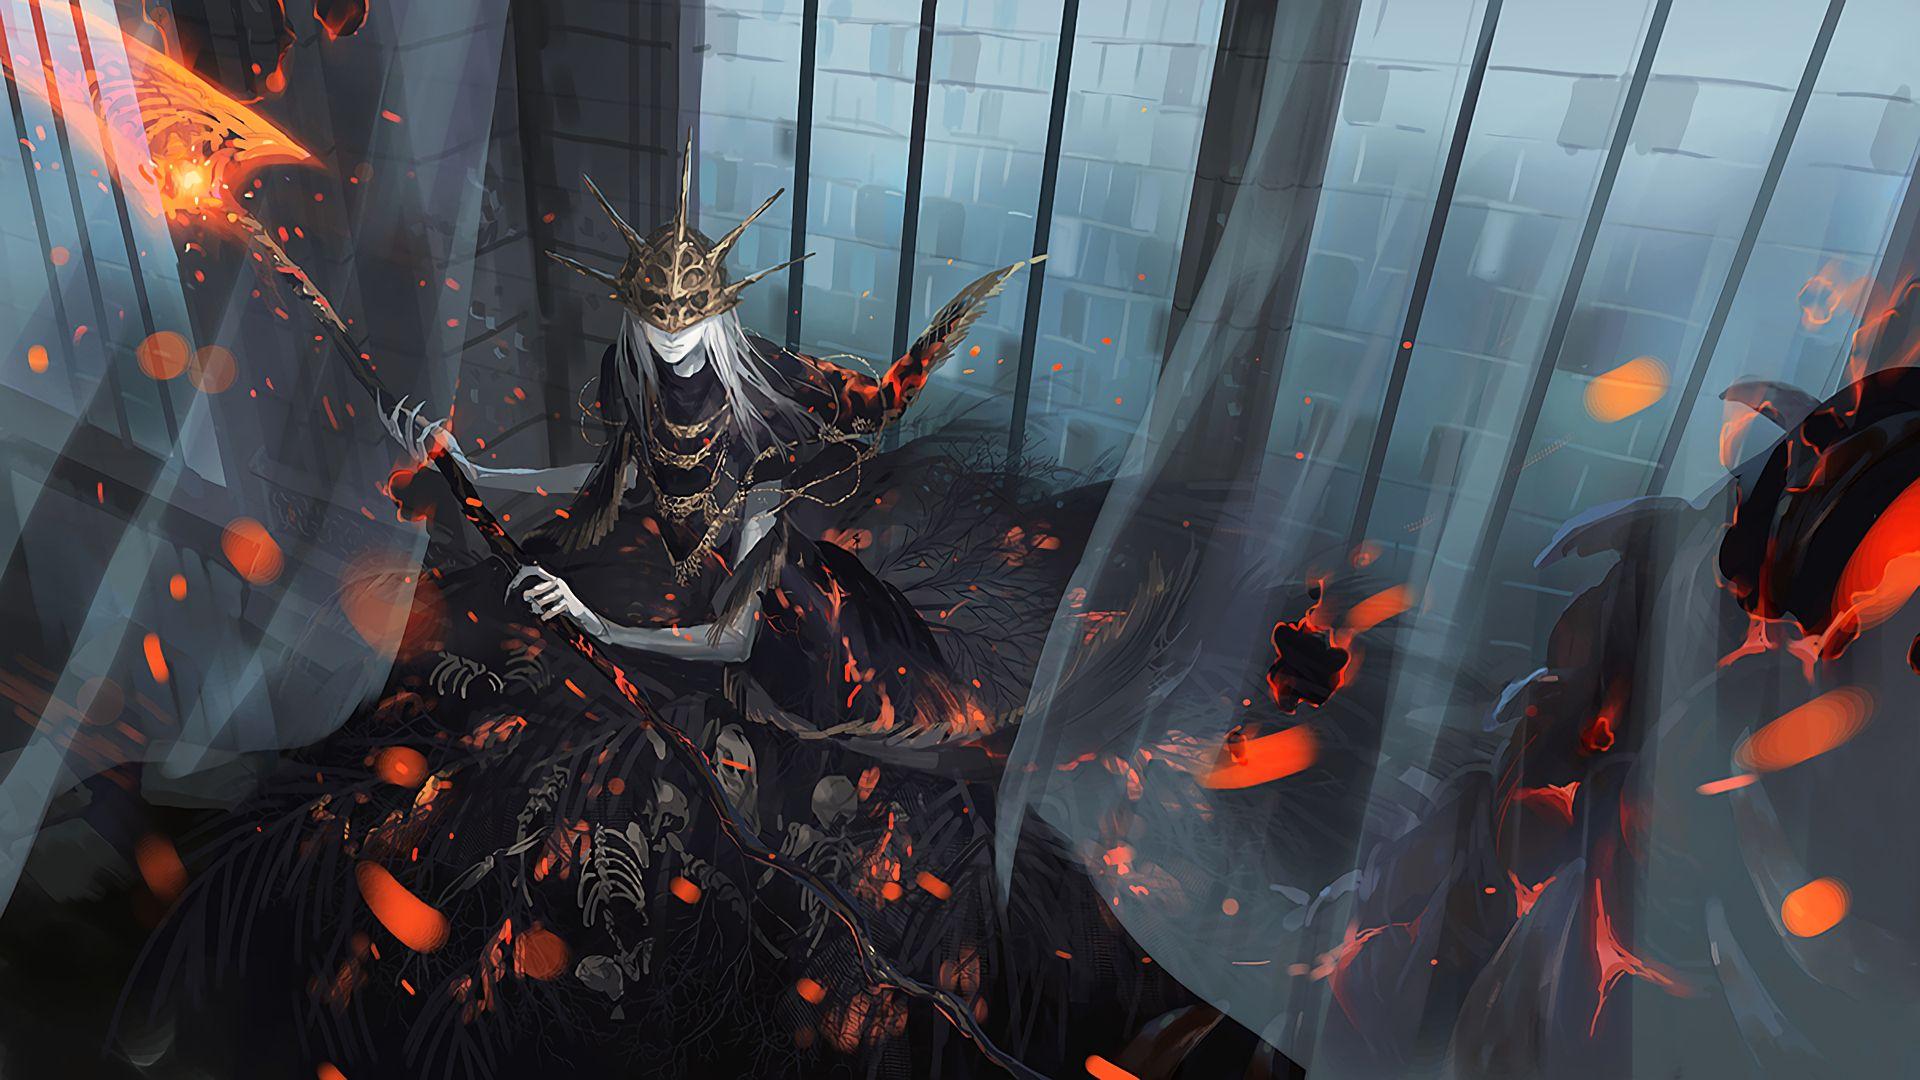 Dark Souls And Bloodborne Wallpaper Dump Spoilers Ahead